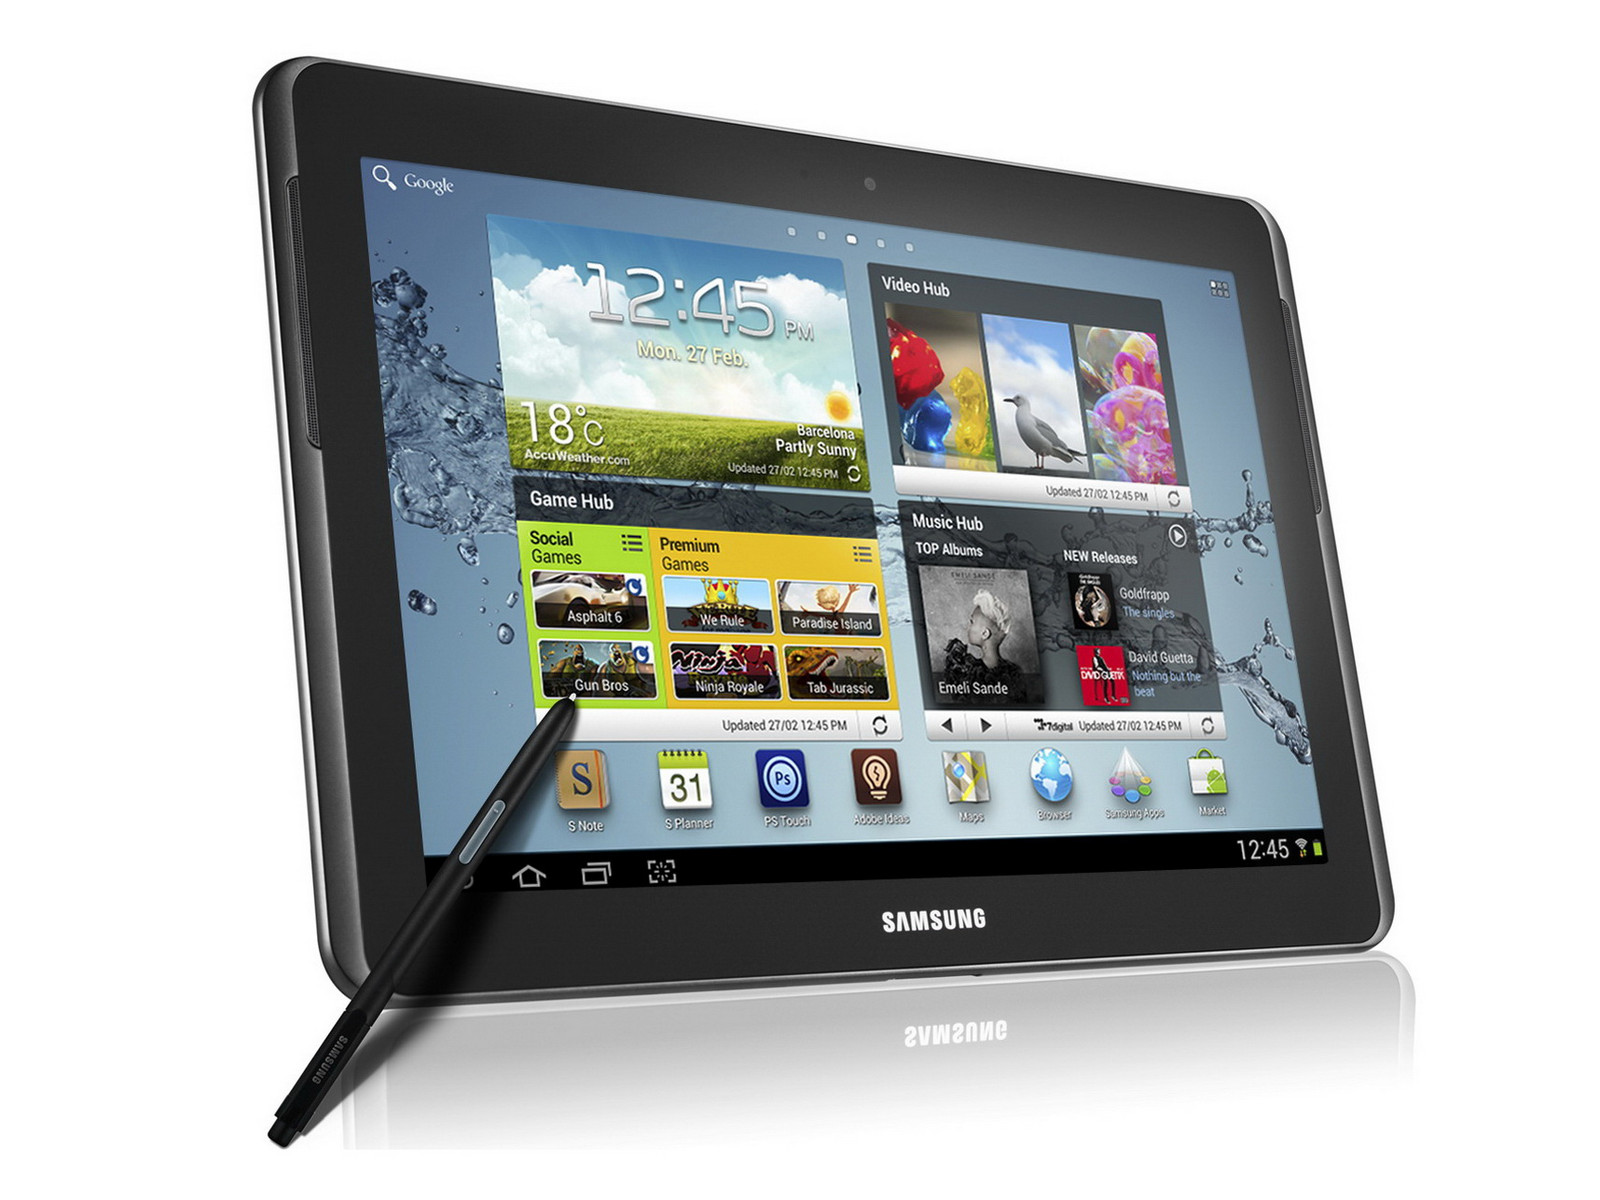 samsung pr sentiert 10 1 zoll tablet galaxy note 10 1. Black Bedroom Furniture Sets. Home Design Ideas